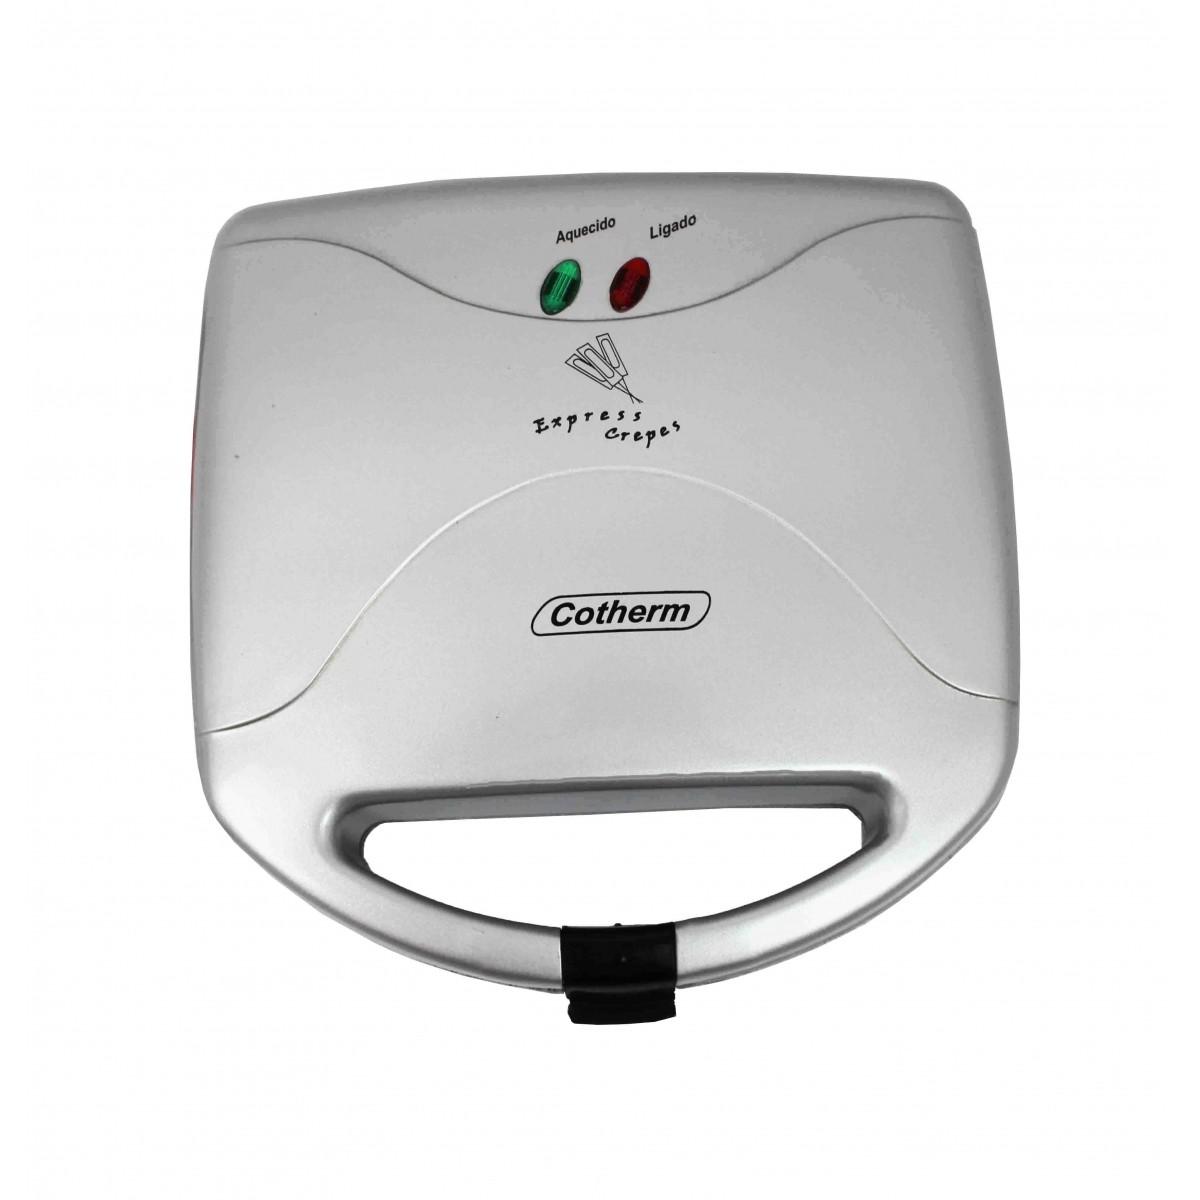 Maquina de Crepe Cotherm Express Crepes - Crepe Suiço  - Topcom Eletro